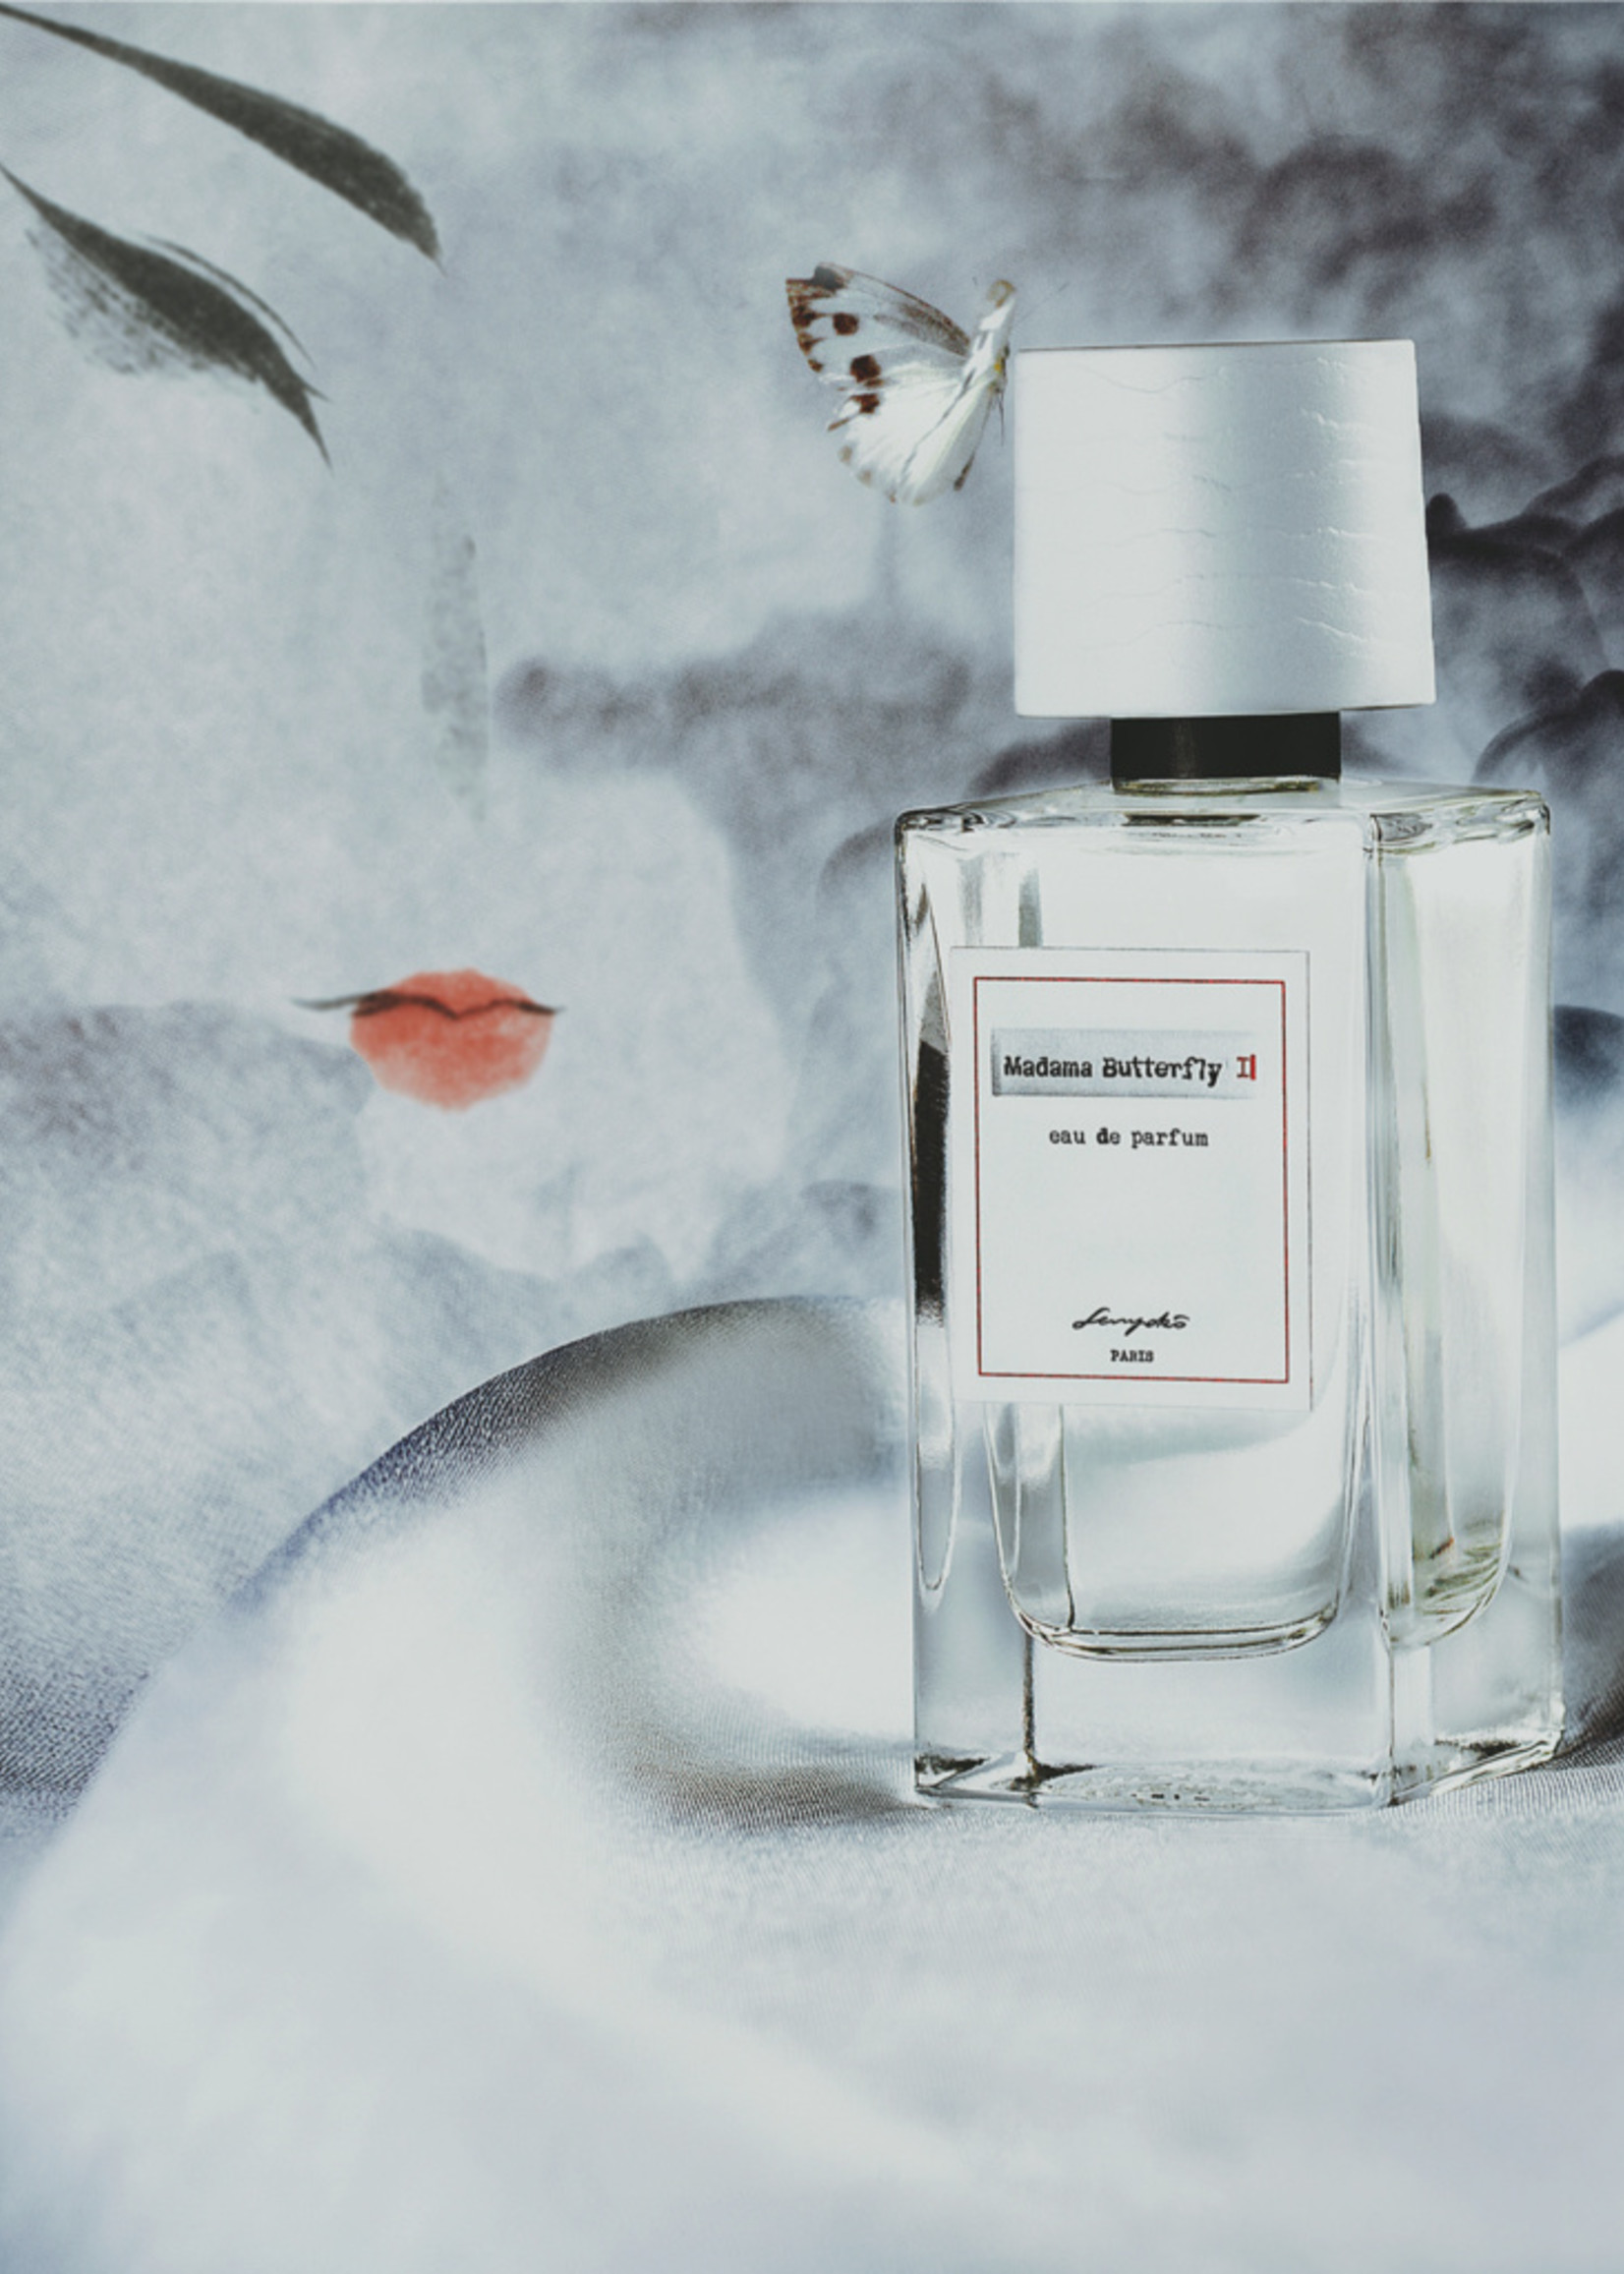 Senyokô Senyokô - Madama Butterfly II - eau de parfum